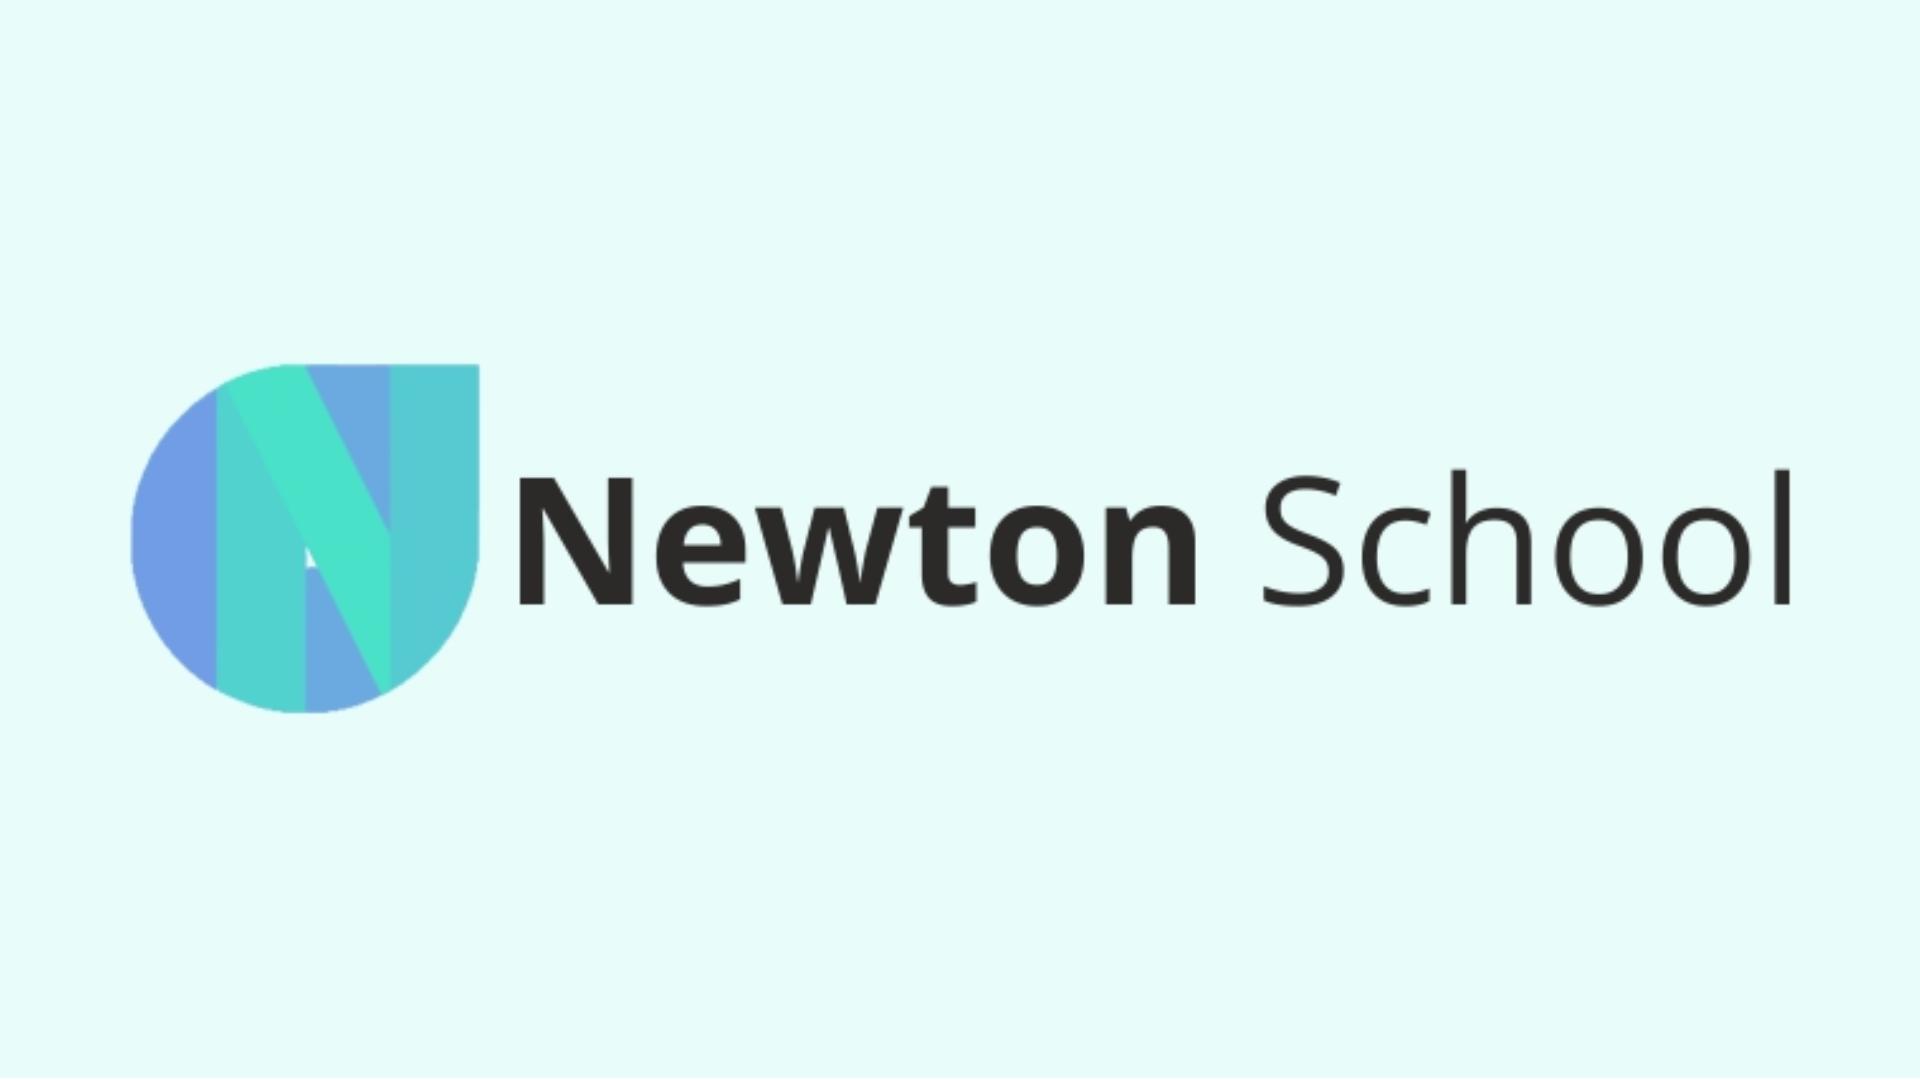 Newton School is Hiring for Youtube Community Management Associates